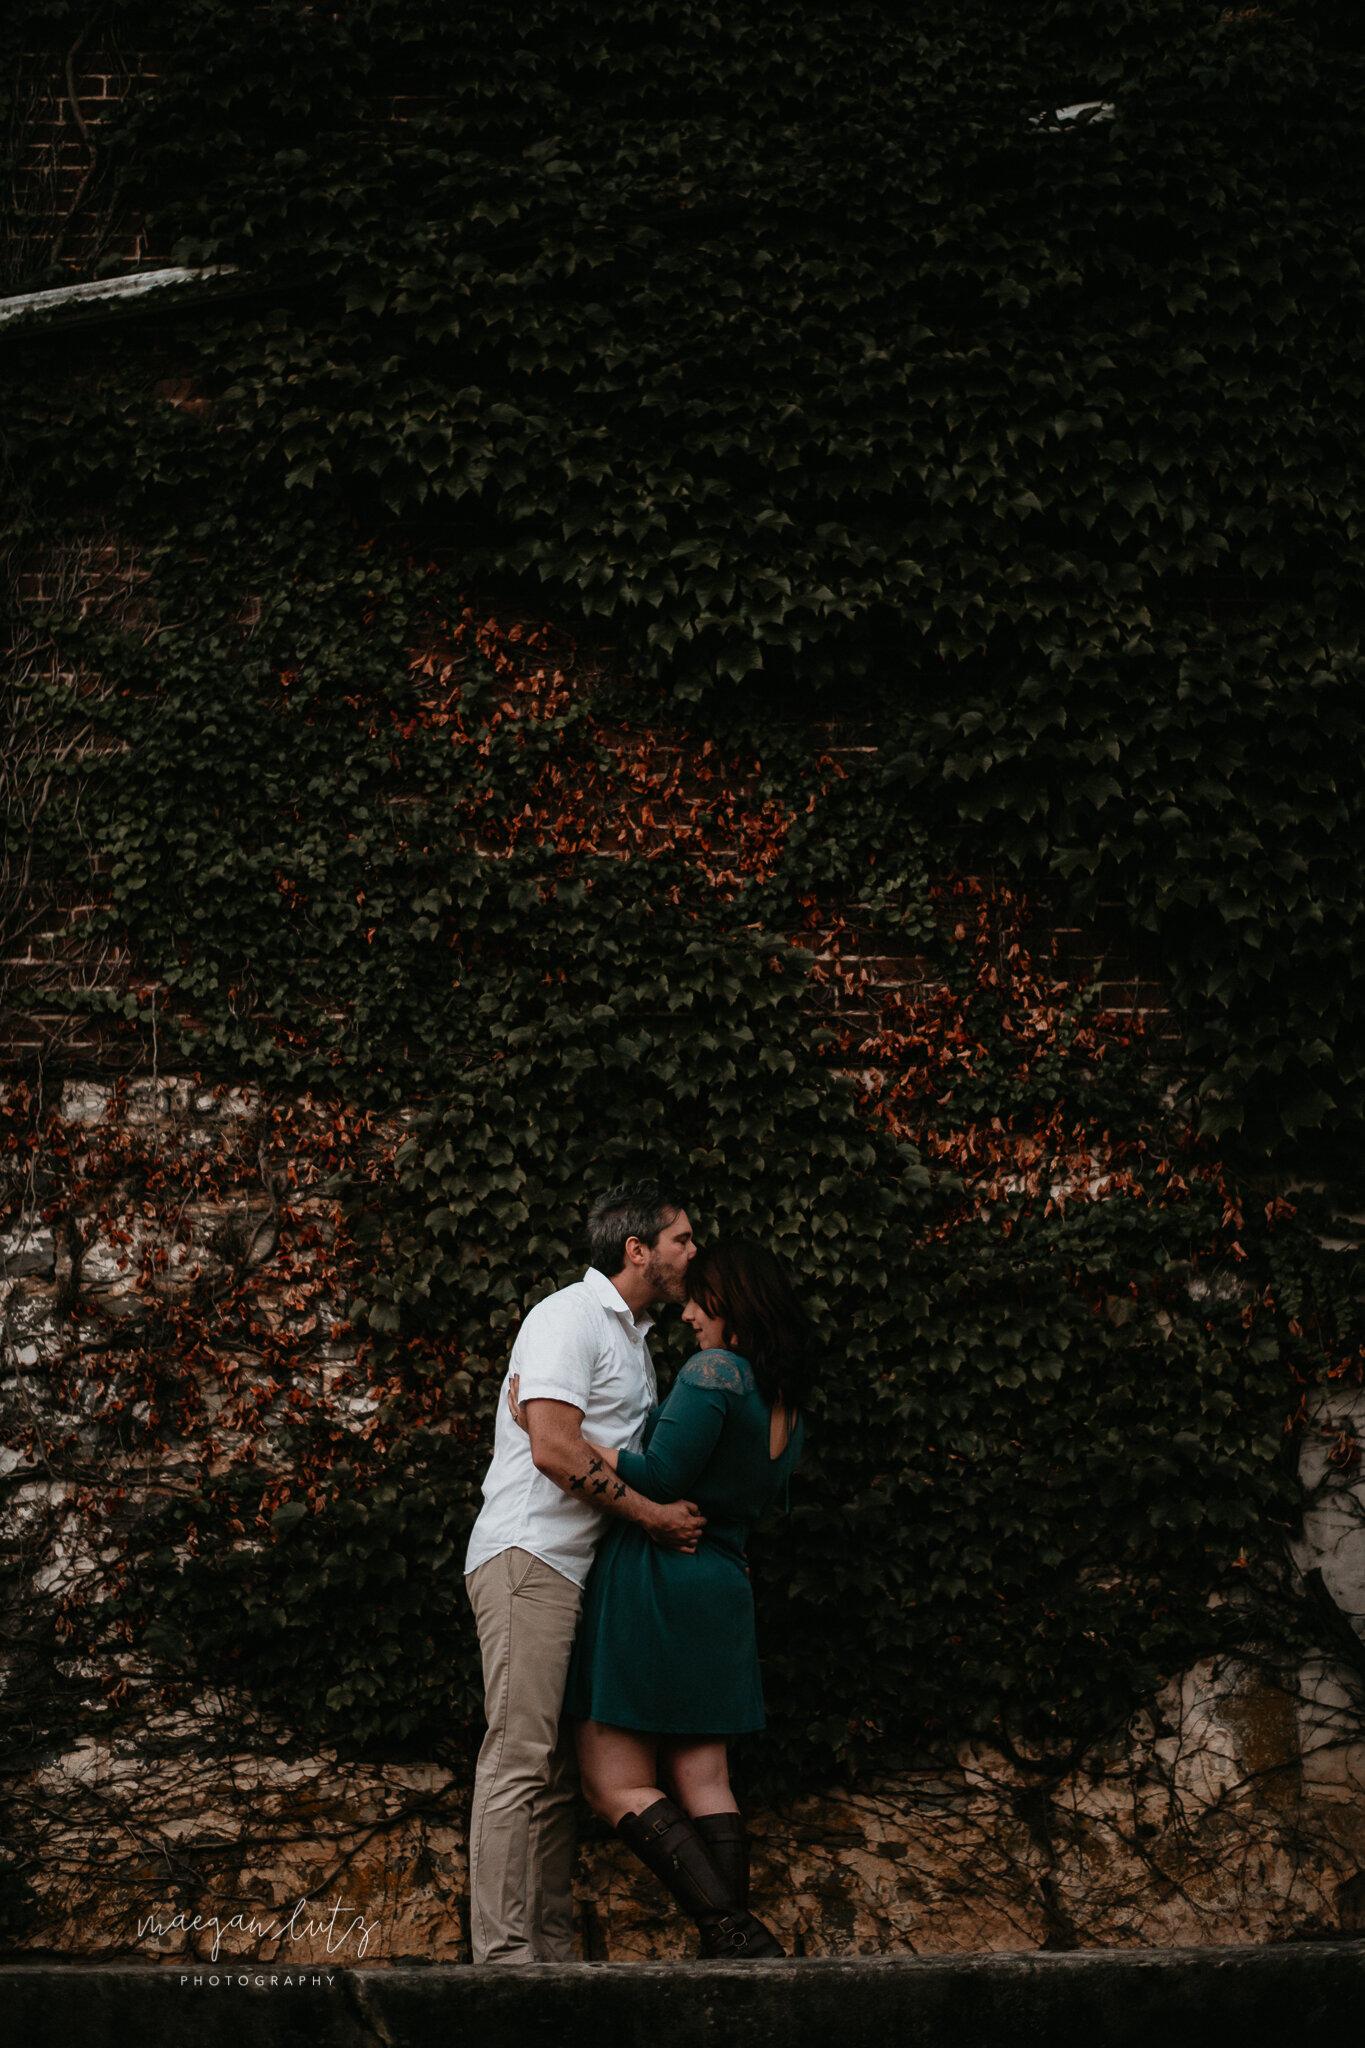 NEPA-Lehigh-Valley-Wedding-Engagement-photographer-at-the-rose-garden-allentown-PA-38.jpg